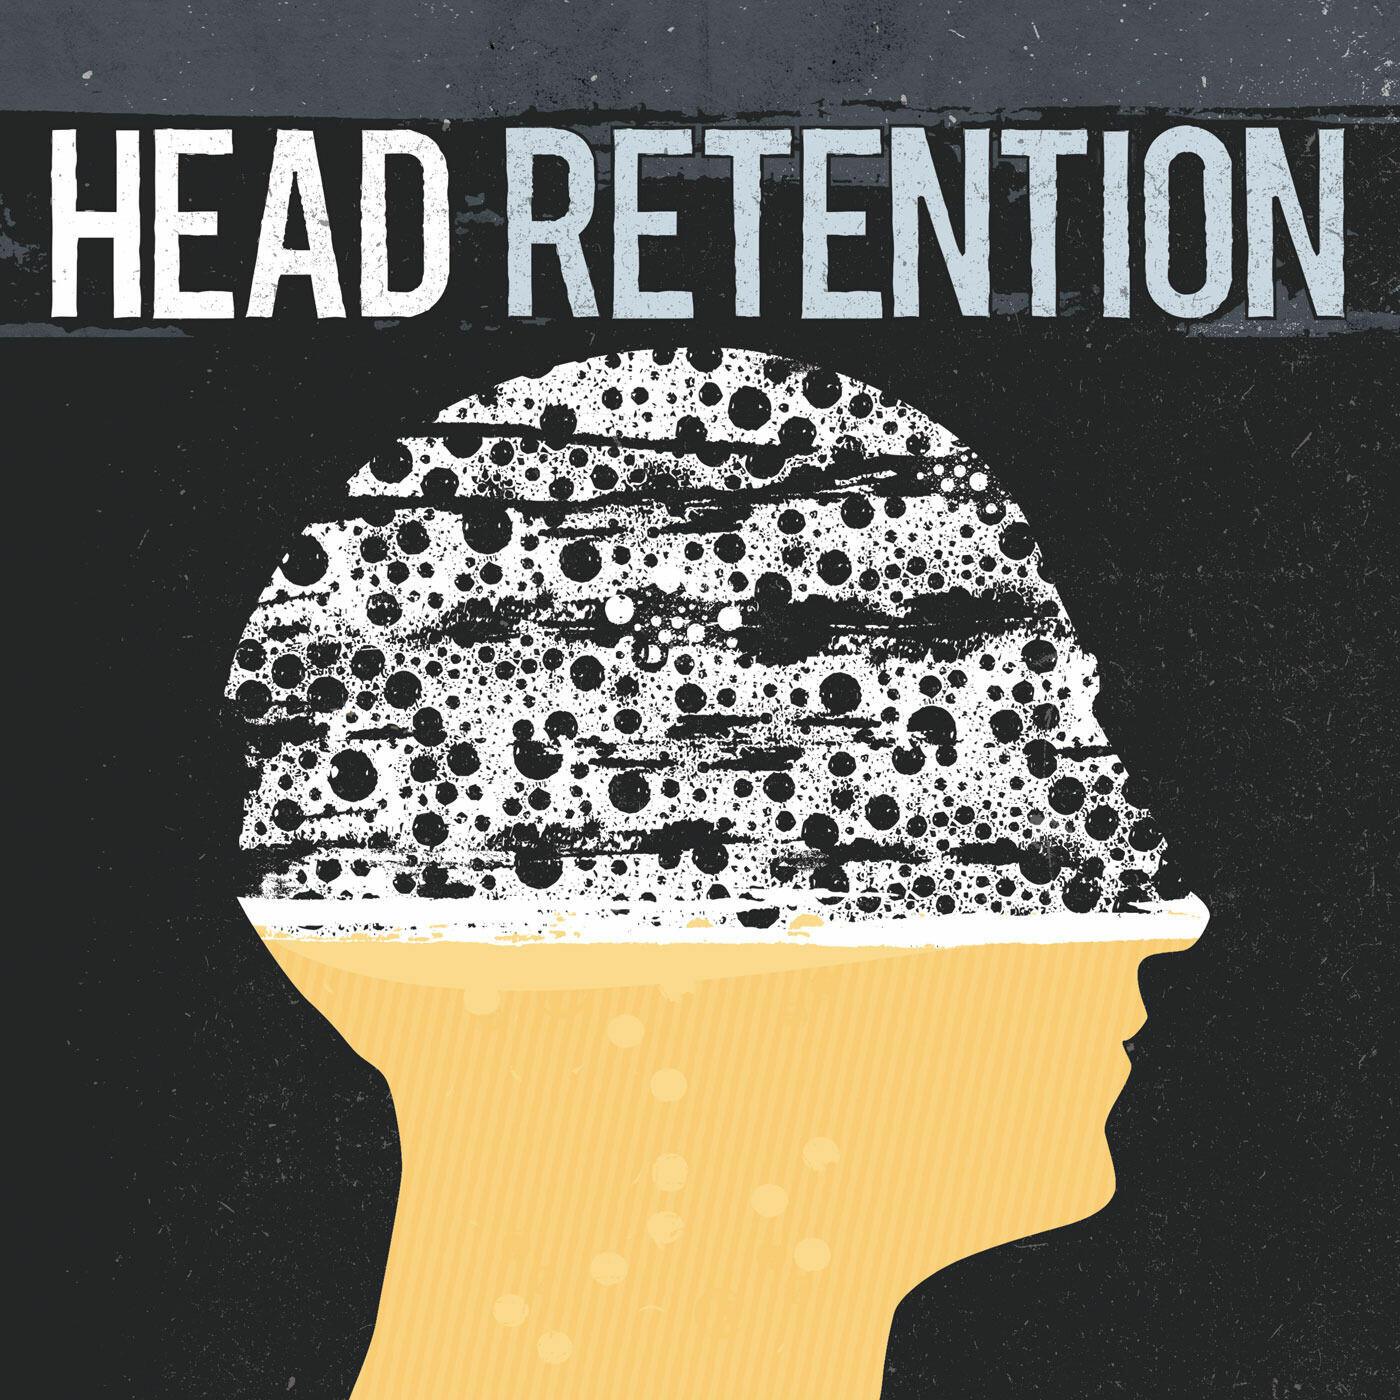 Head Retention